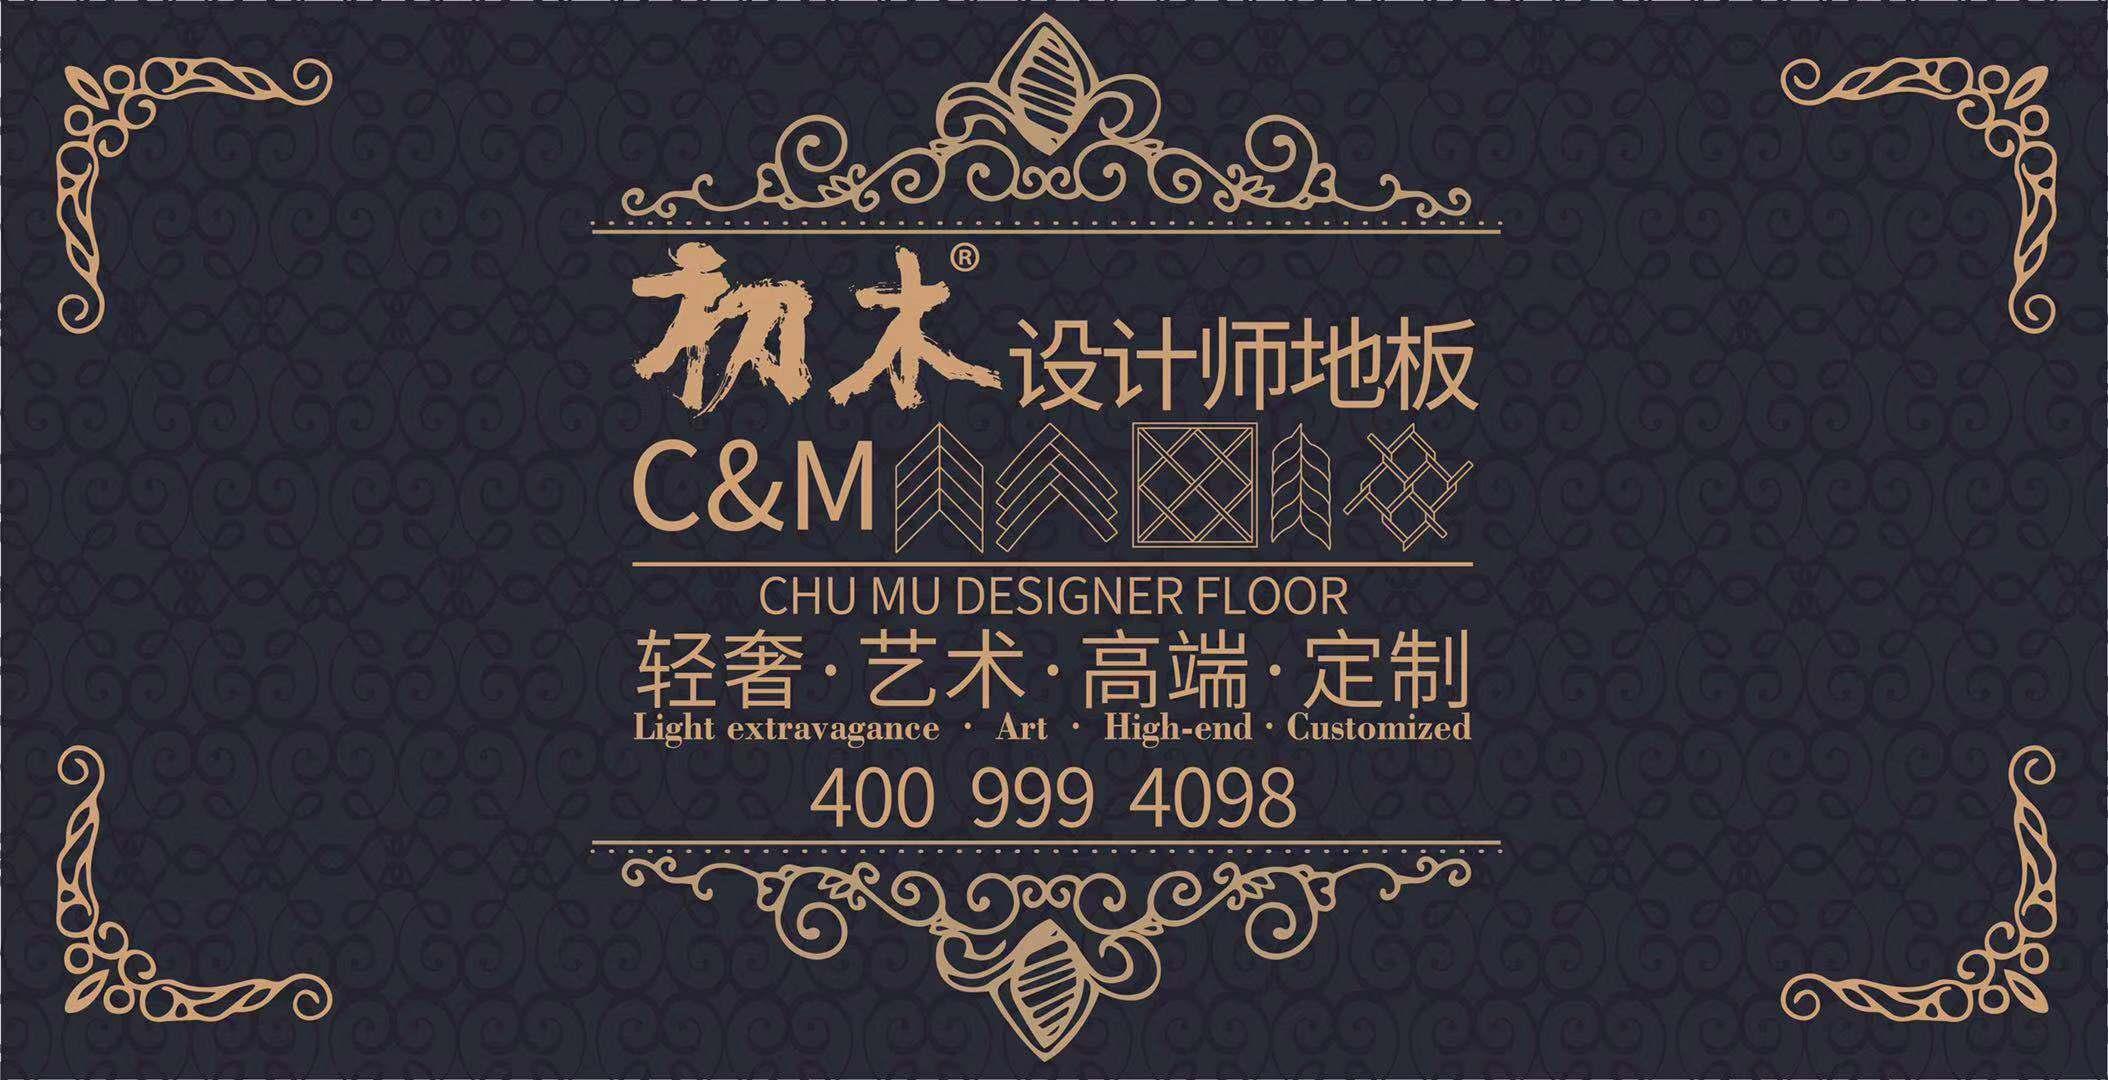 C&M初木欧洲原创设计地板让你明白什么是高端定制地板